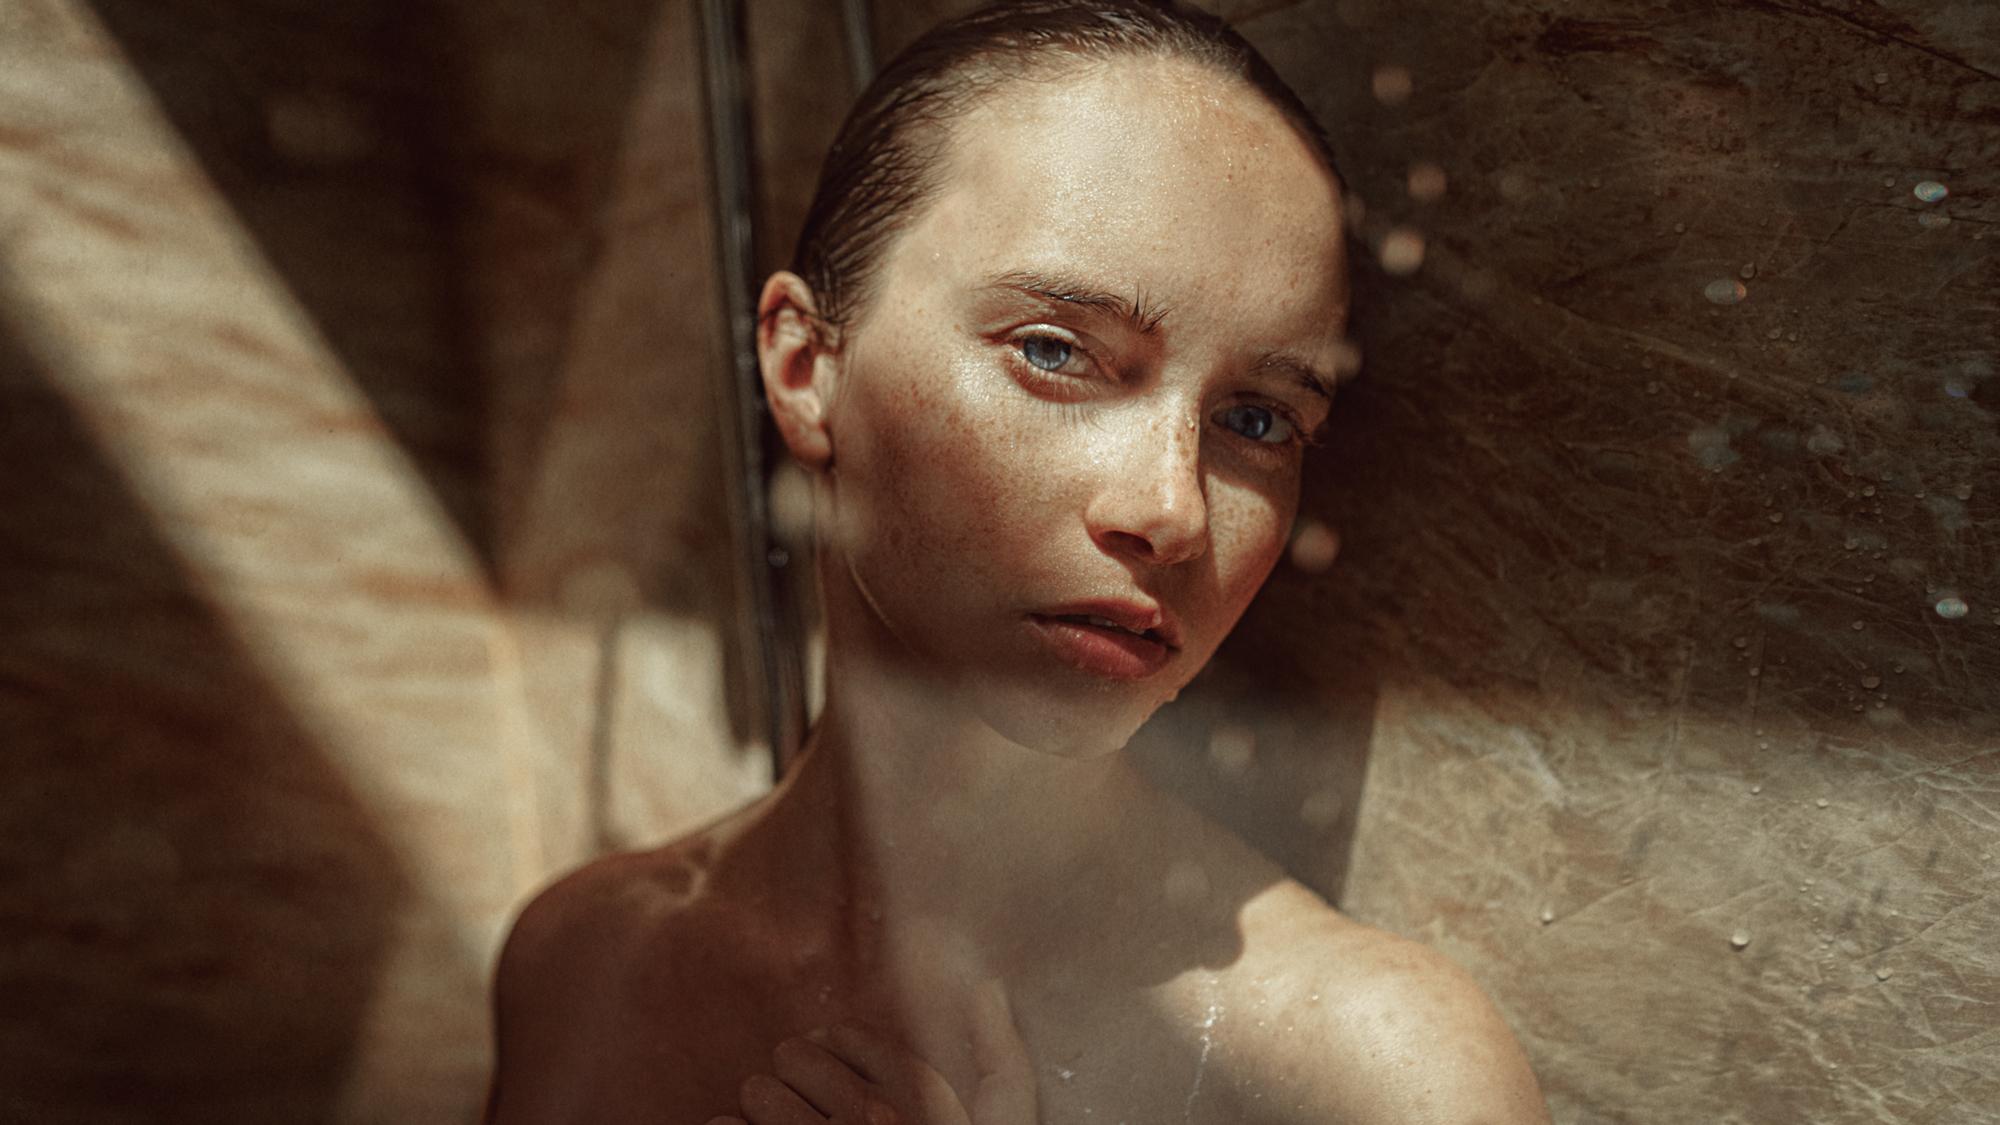 Настя 2020 / фотограф Георгий Чернядьев